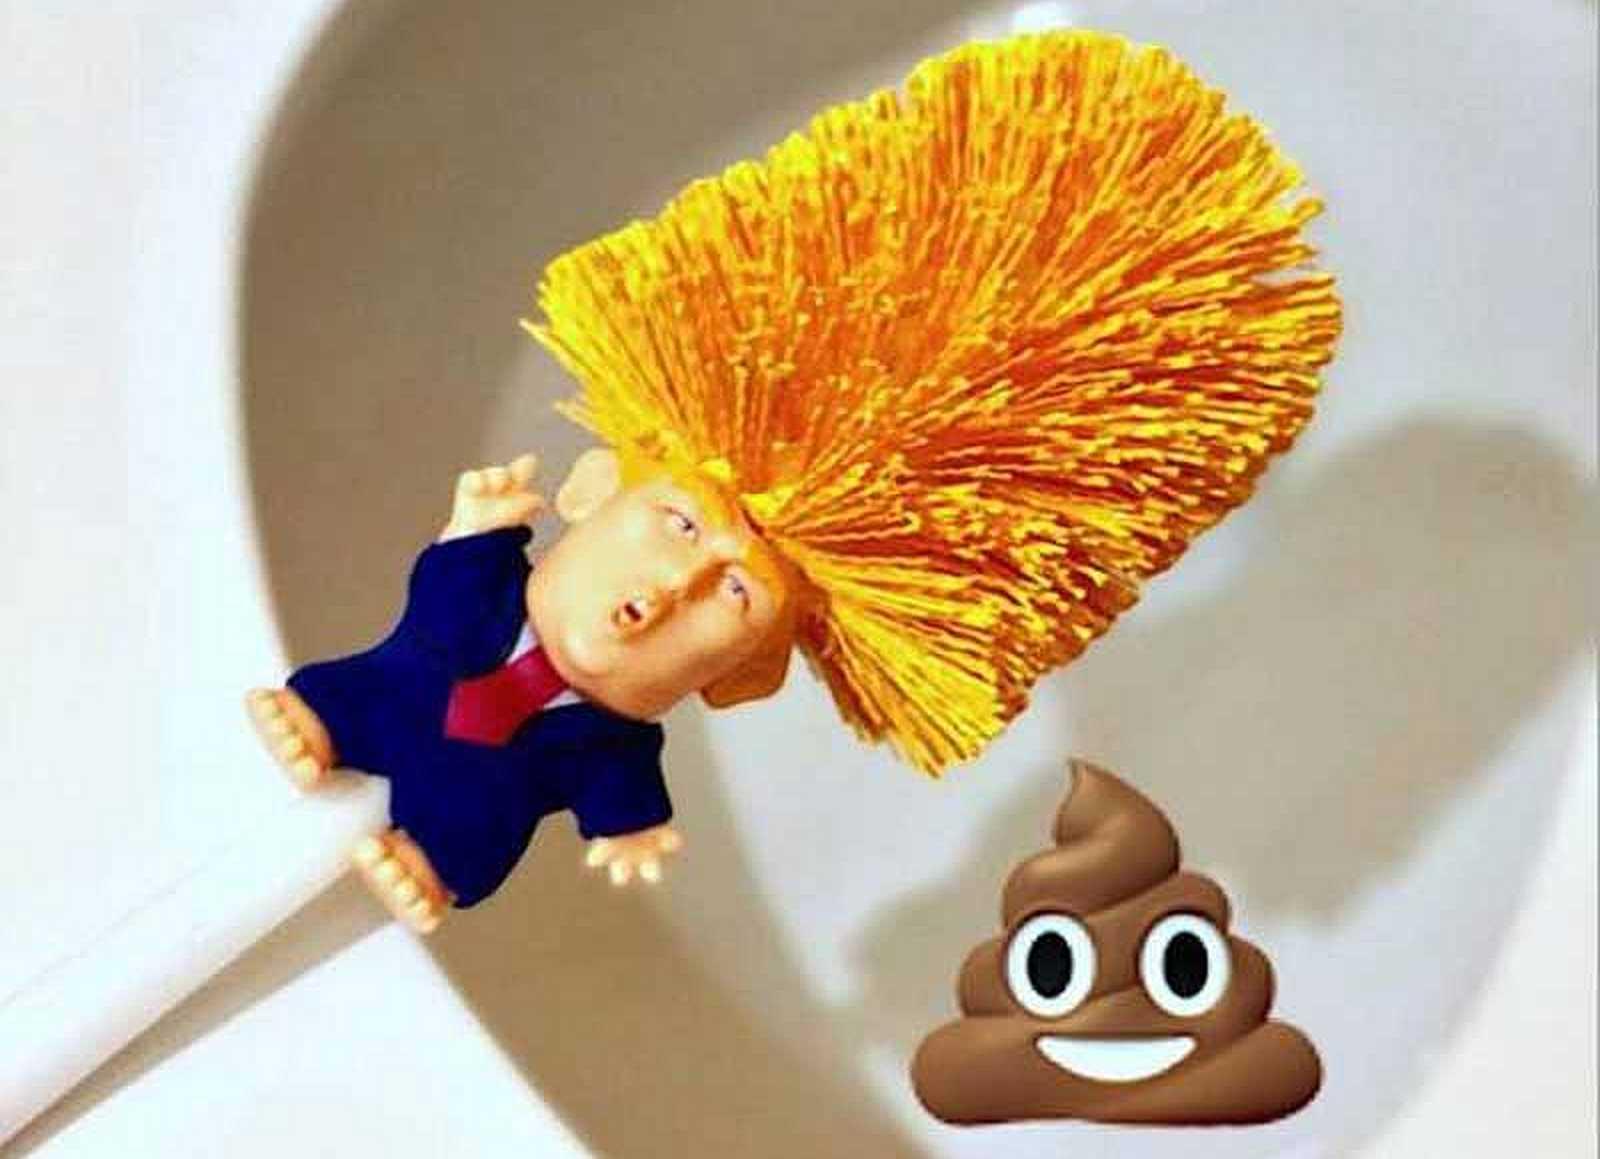 donald trump toilet cleaner